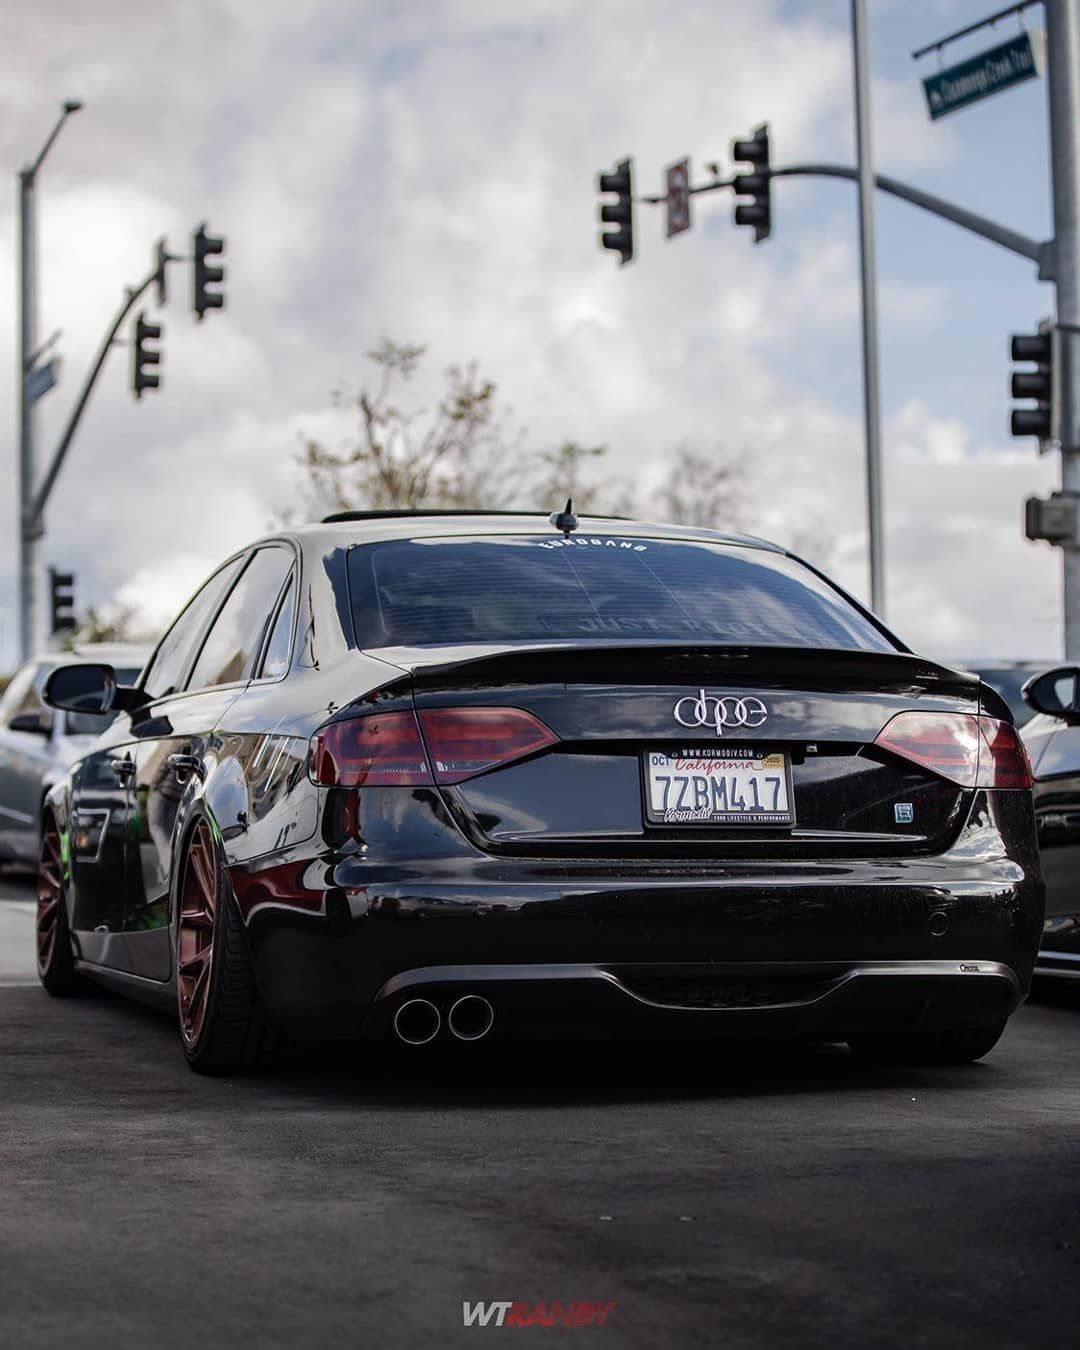 Audilooo Ver On Instagram Beautiful Black A4 B8 Build Rate This Audi From 1 100 Get Discount On Tu Audi Audi A4 Lamborghini Gallardo